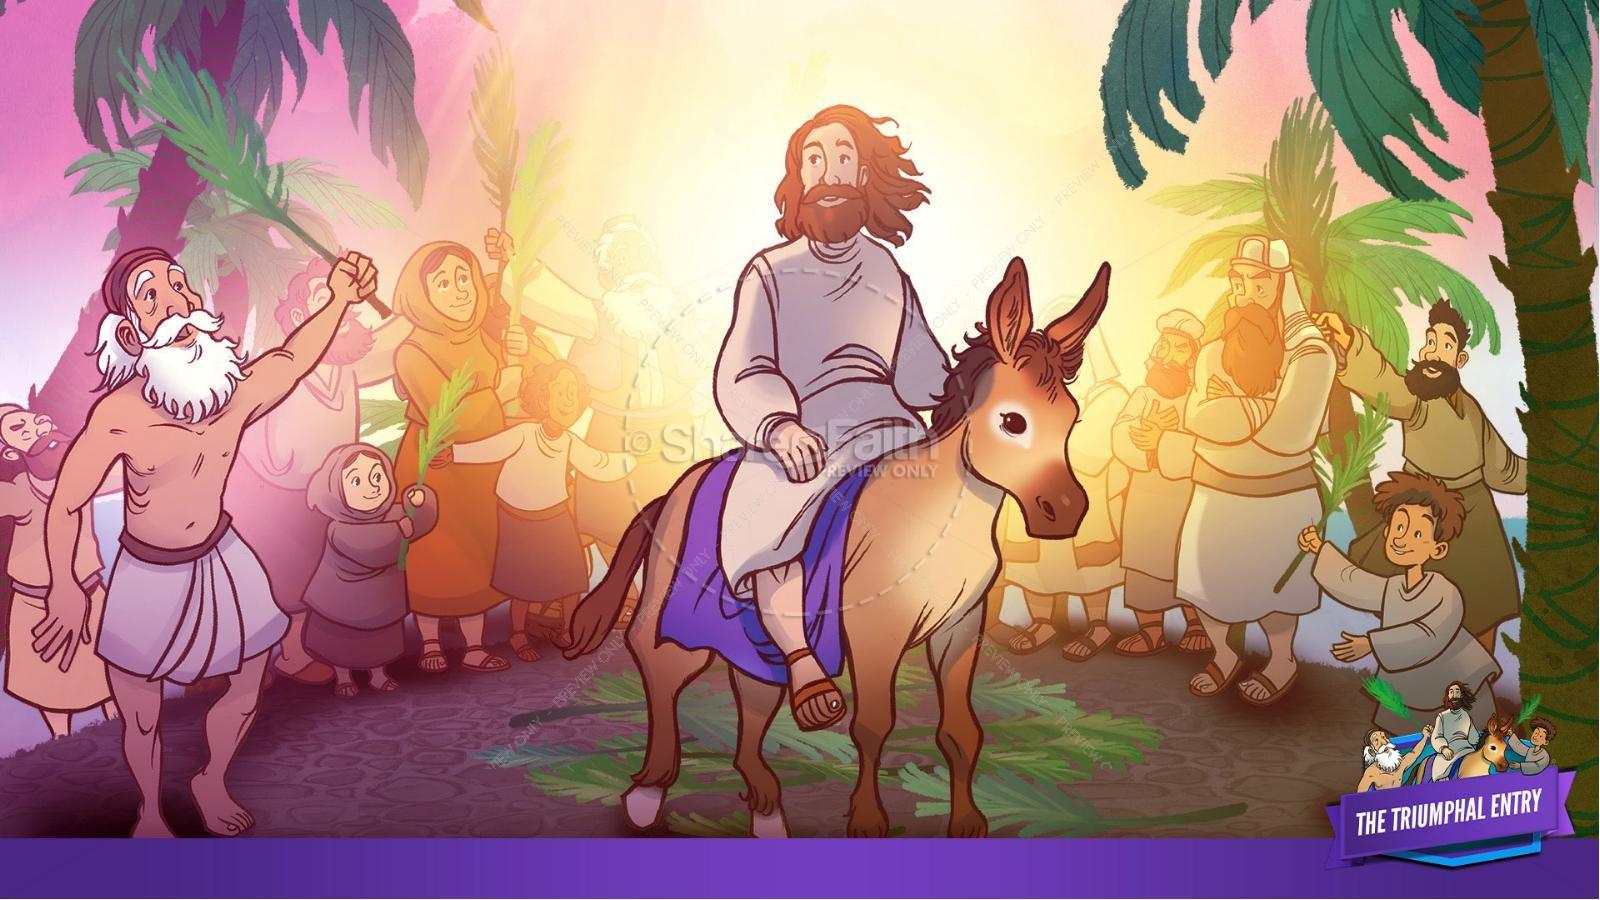 Luke 19 The Triumphal Entry Kids Bible Story | slide 26